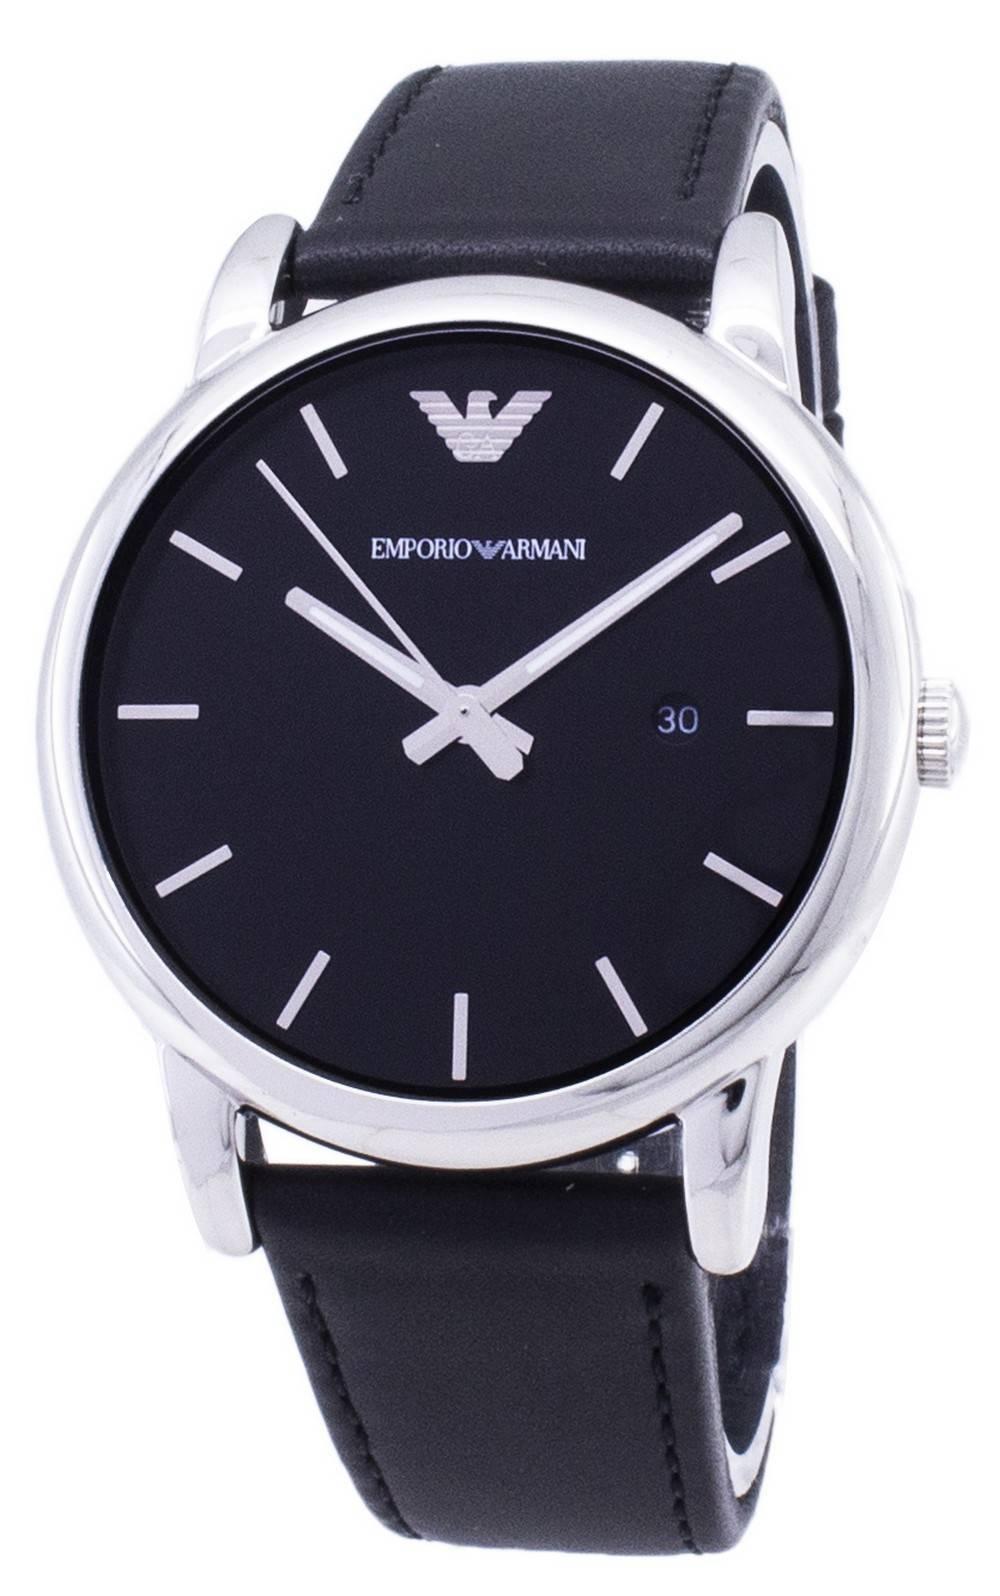 86ed6c760d7f Emporio Armani Classic Black Dial AR1692 Reloj de cuero negro para hombres